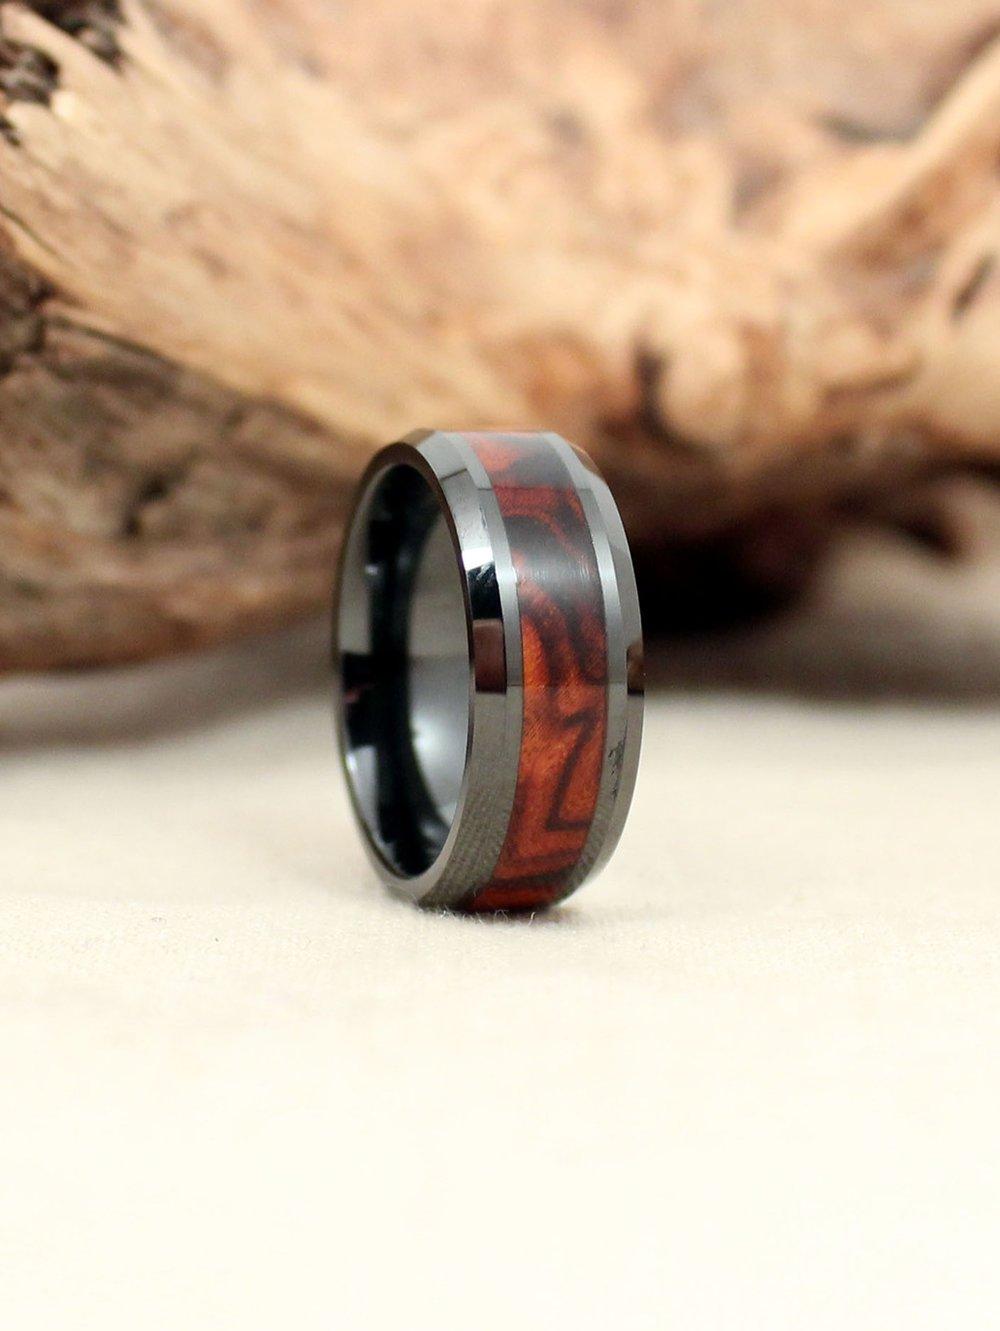 Exhibition Grade Arizona Desert Ironwood Burl and Black Ceramic Wood Ring